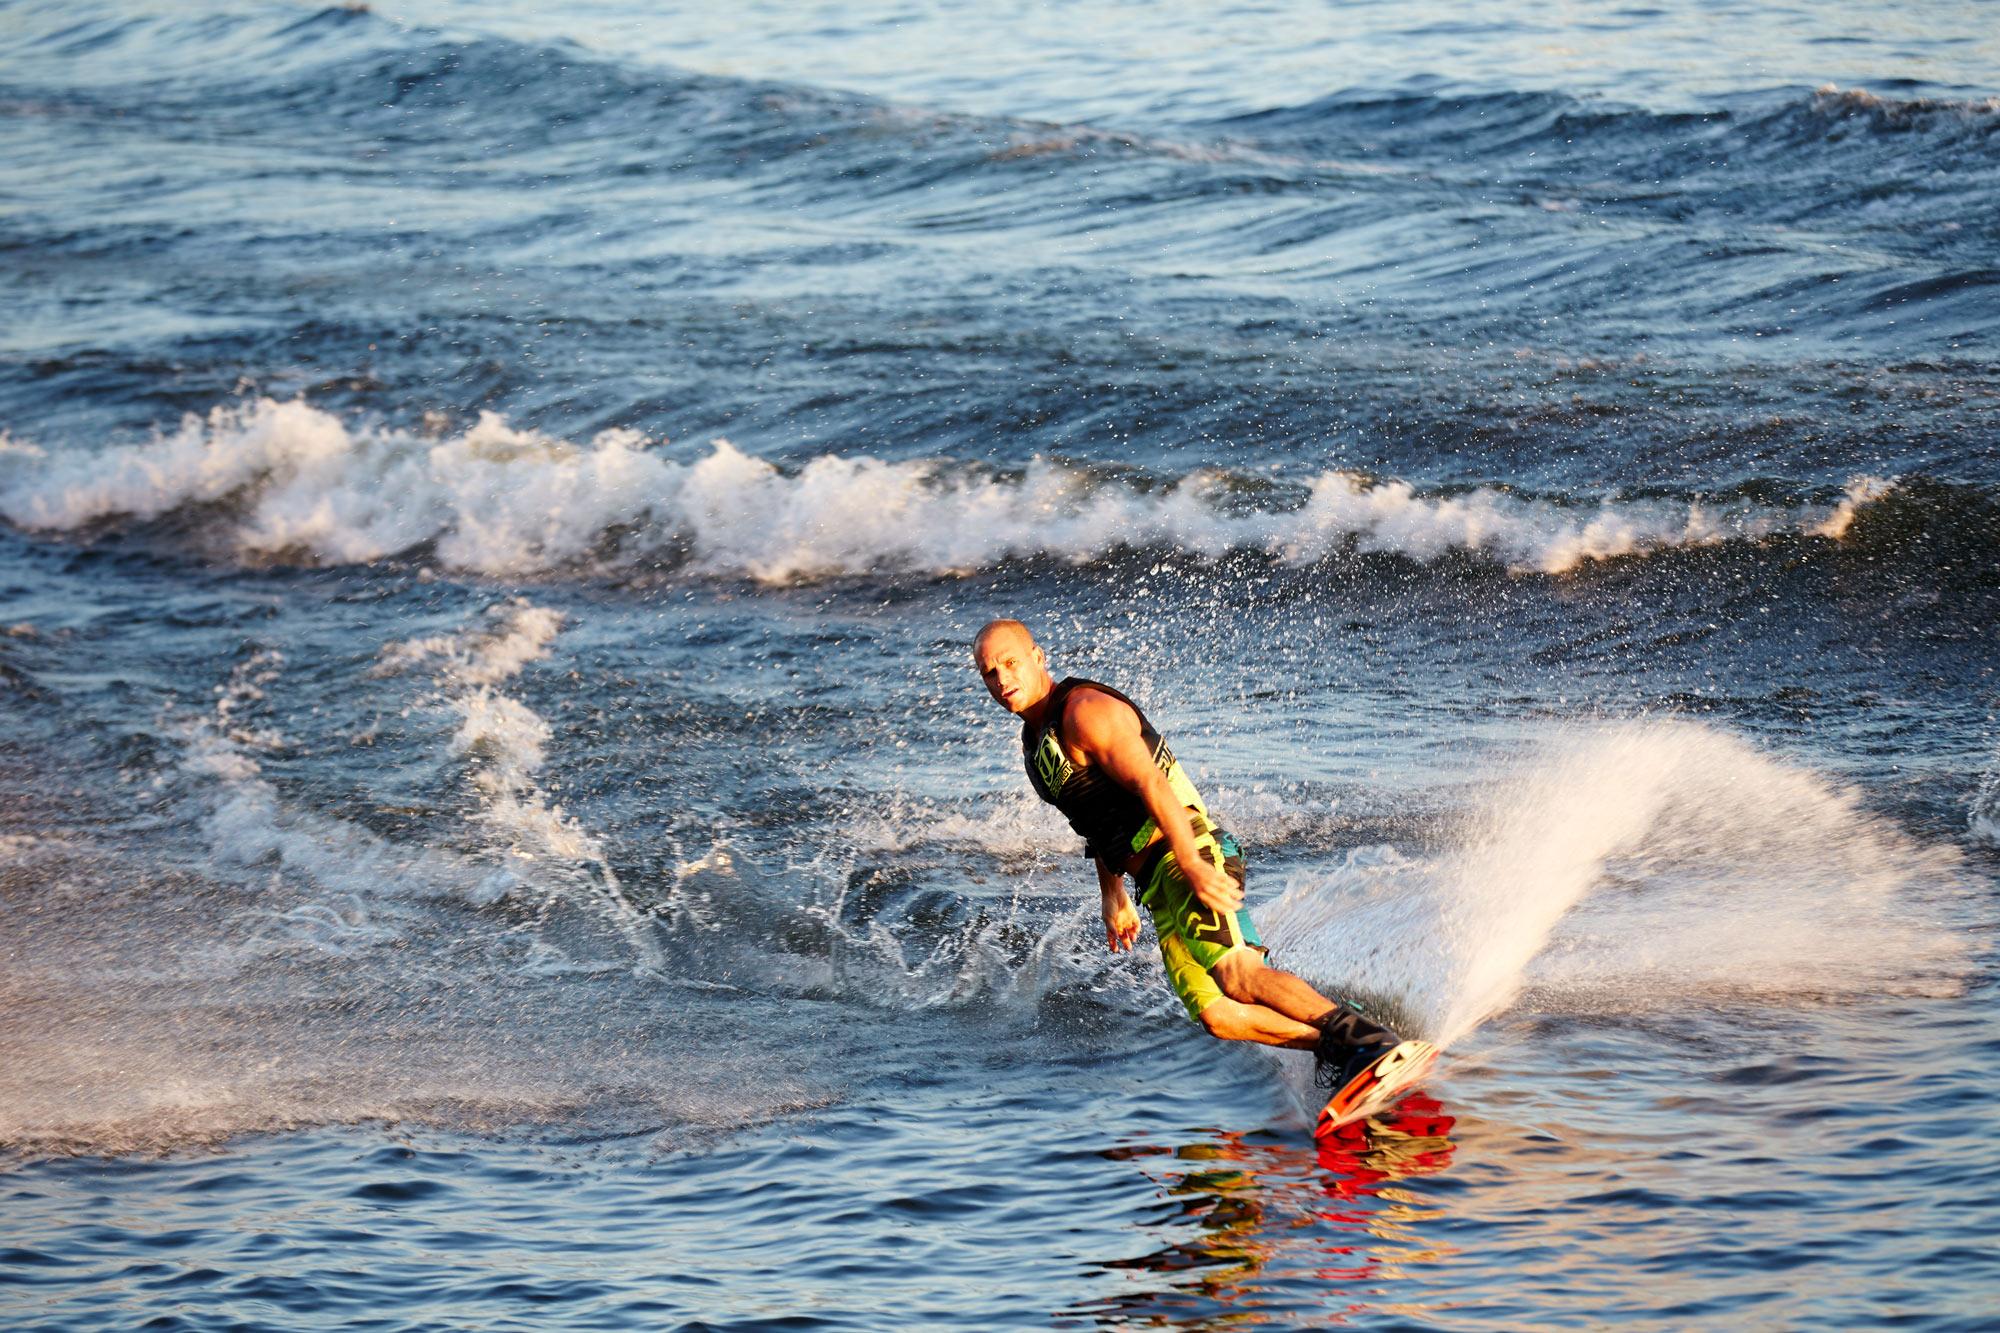 Aqua-bat_wakeboarders-minocqua-071715_268.jpg